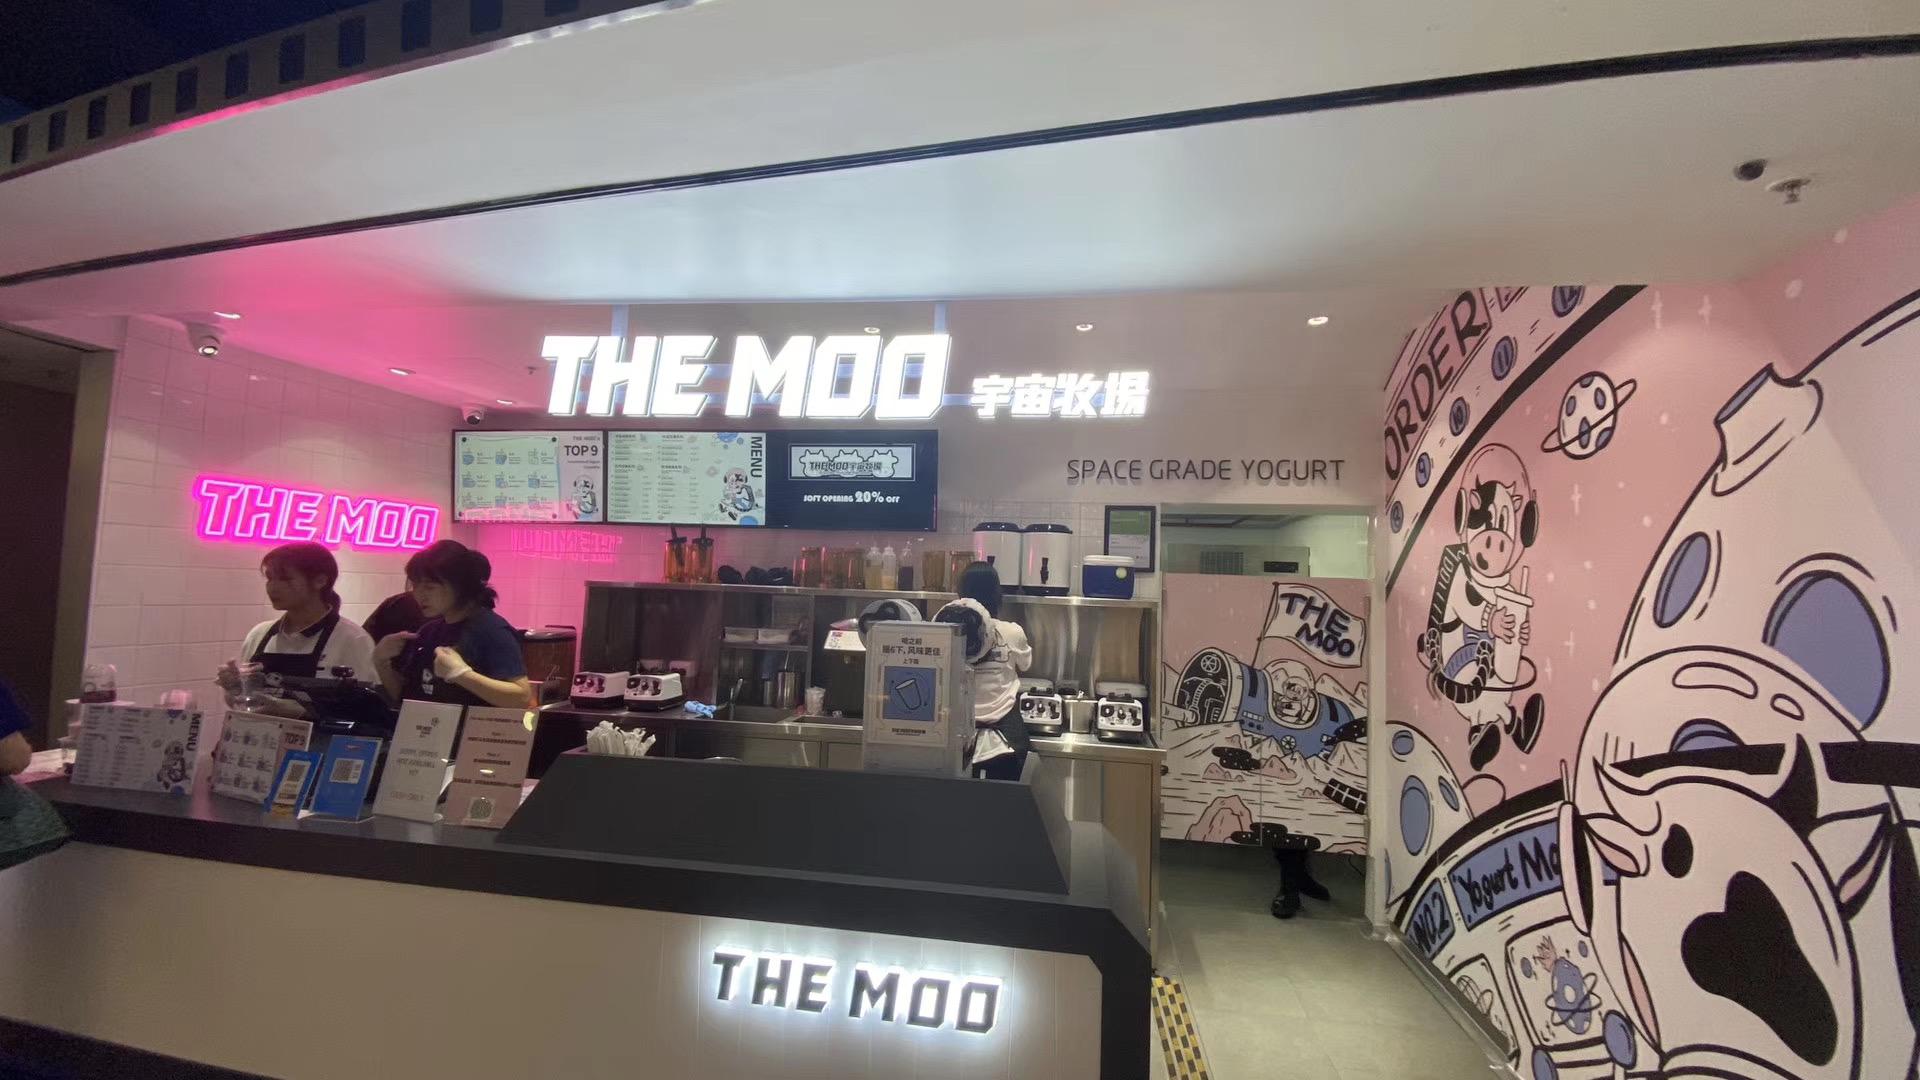 THE MOO city